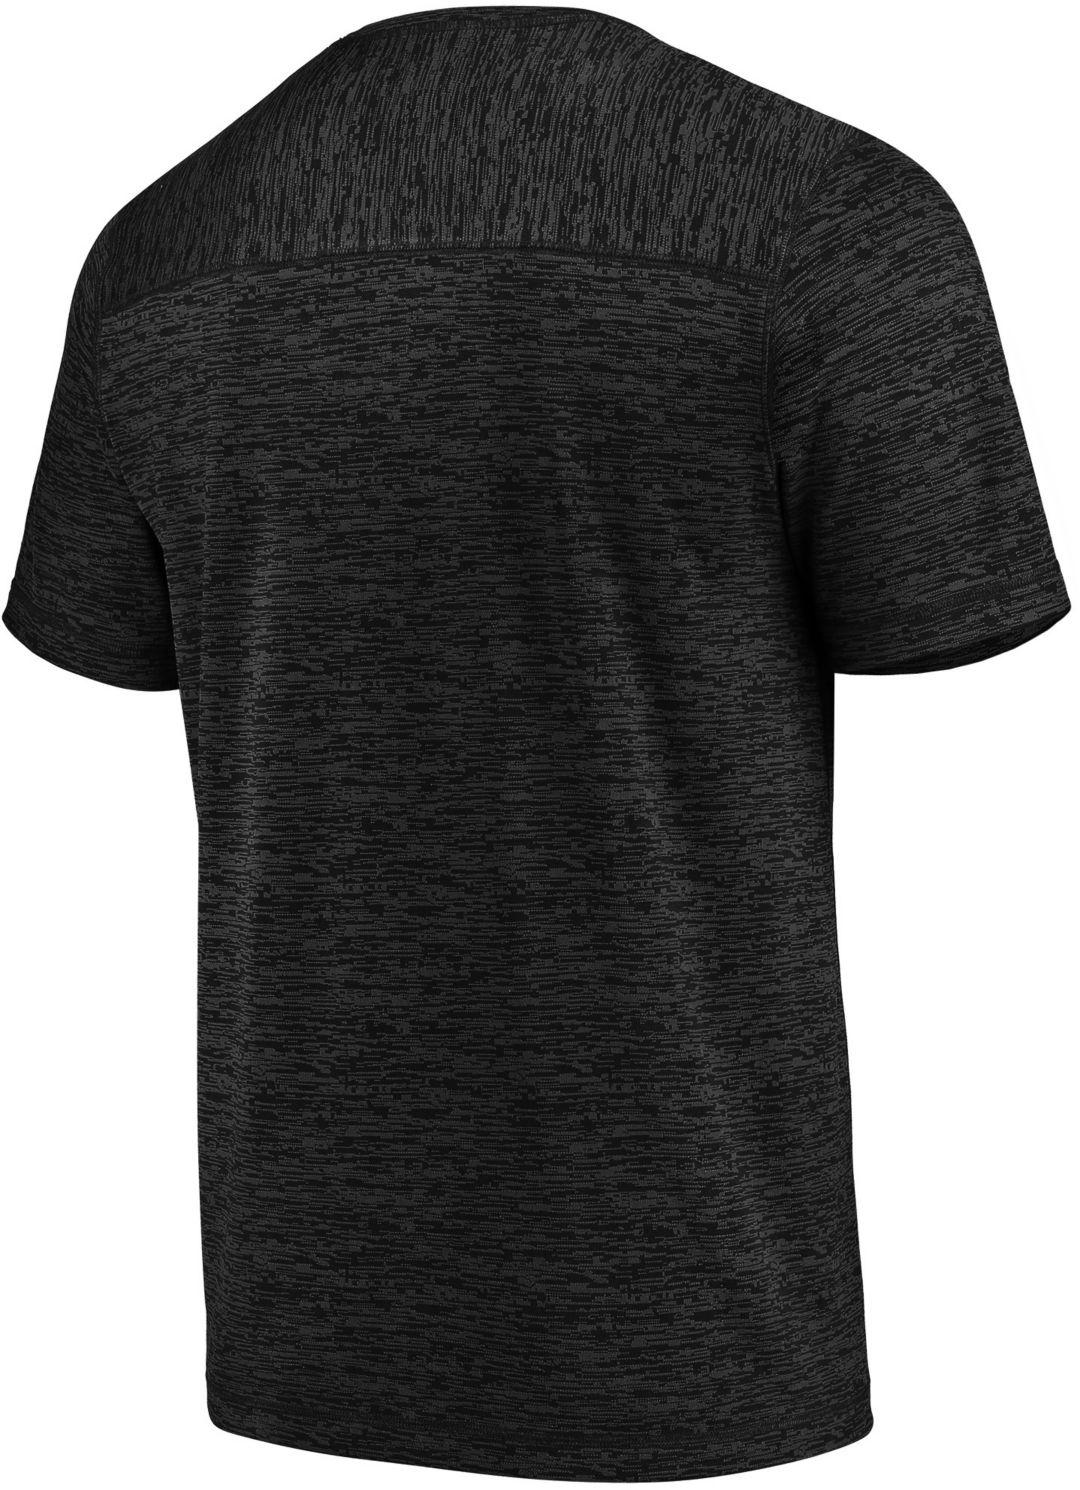 half off 144bf 9ad52 Majestic Men's San Jose Sharks Ultra Streak Black Heathered T-Shirt